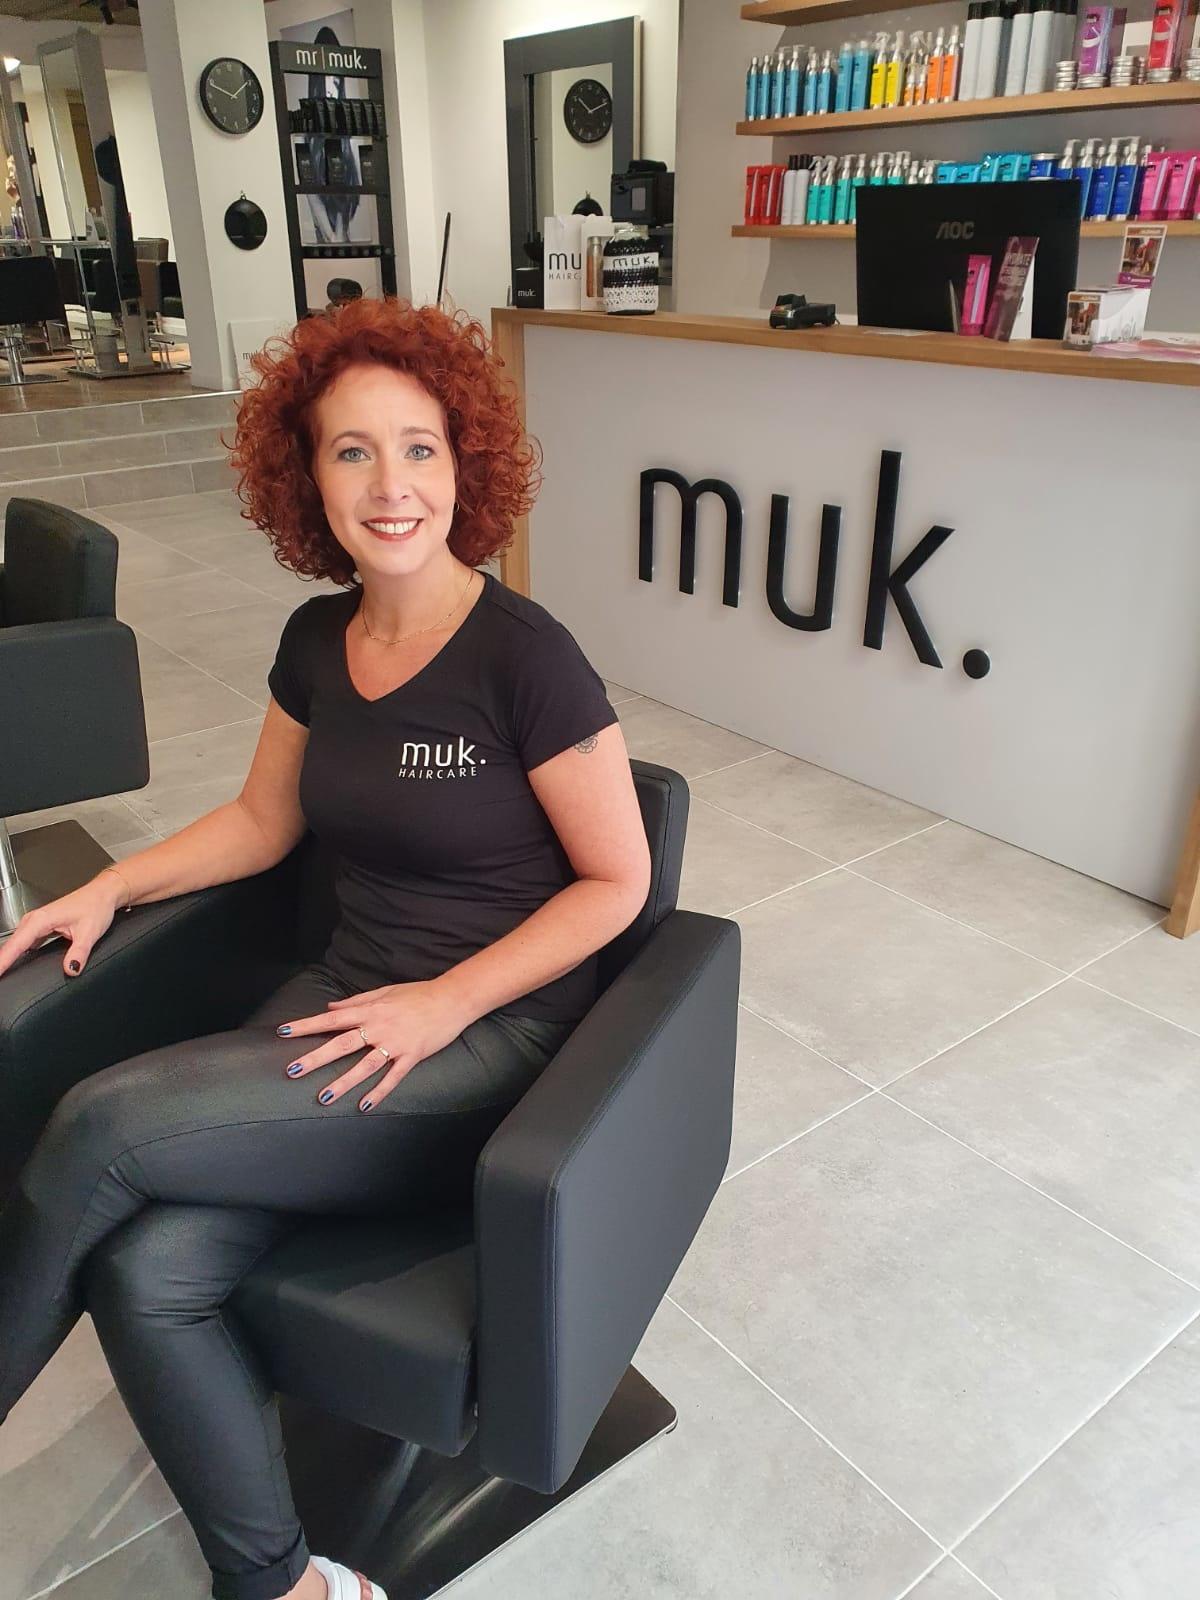 Jessica muk Haircare